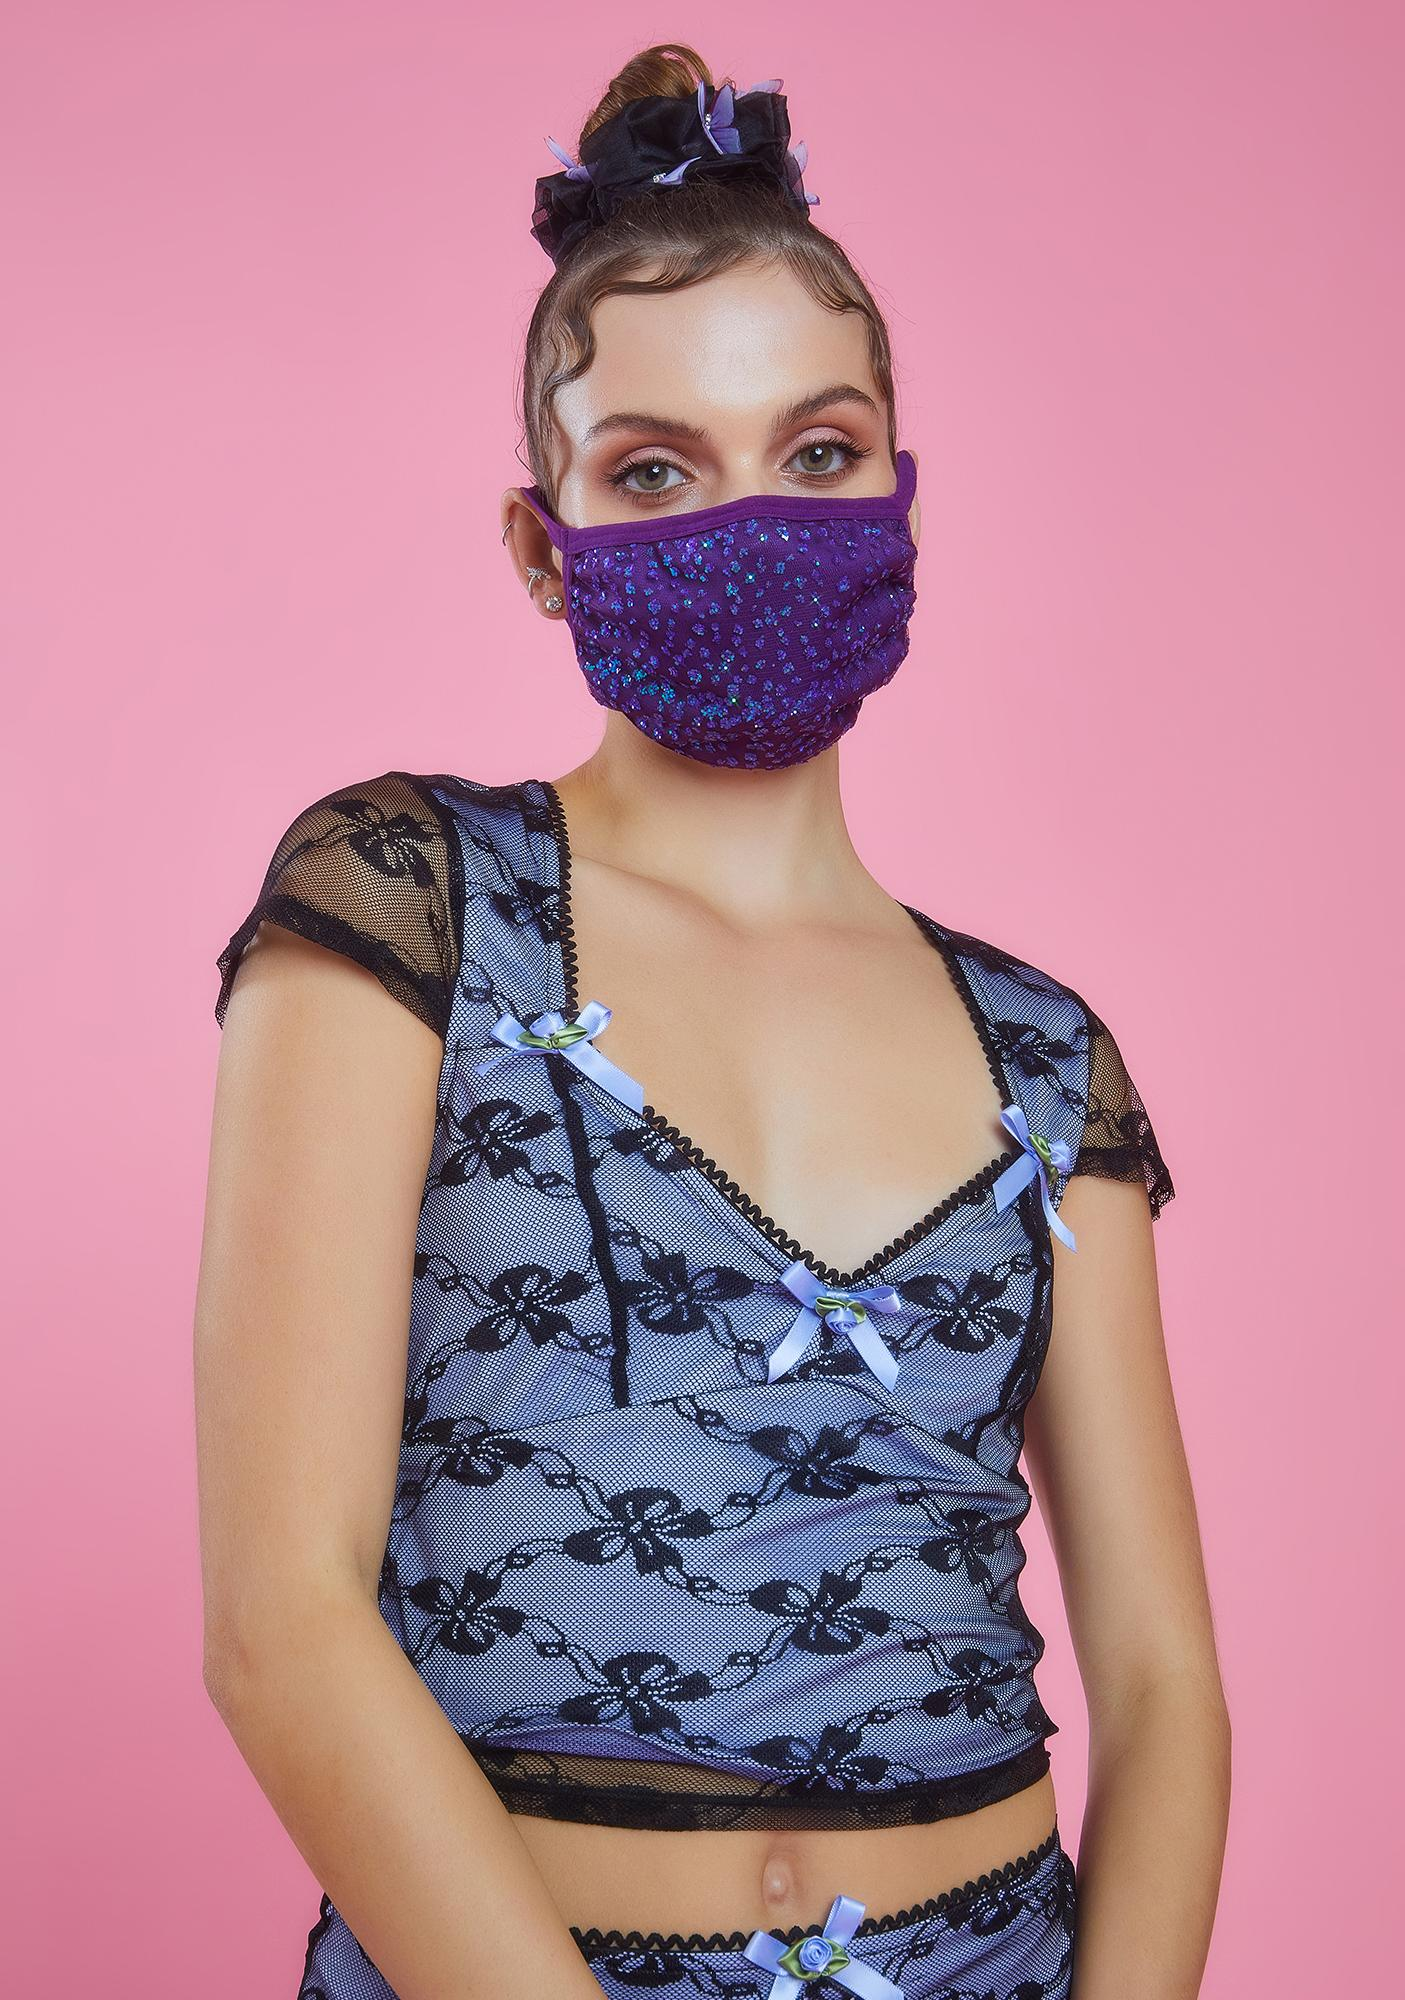 Sugar Thrillz Fairy Gleam Glitter Face Mask